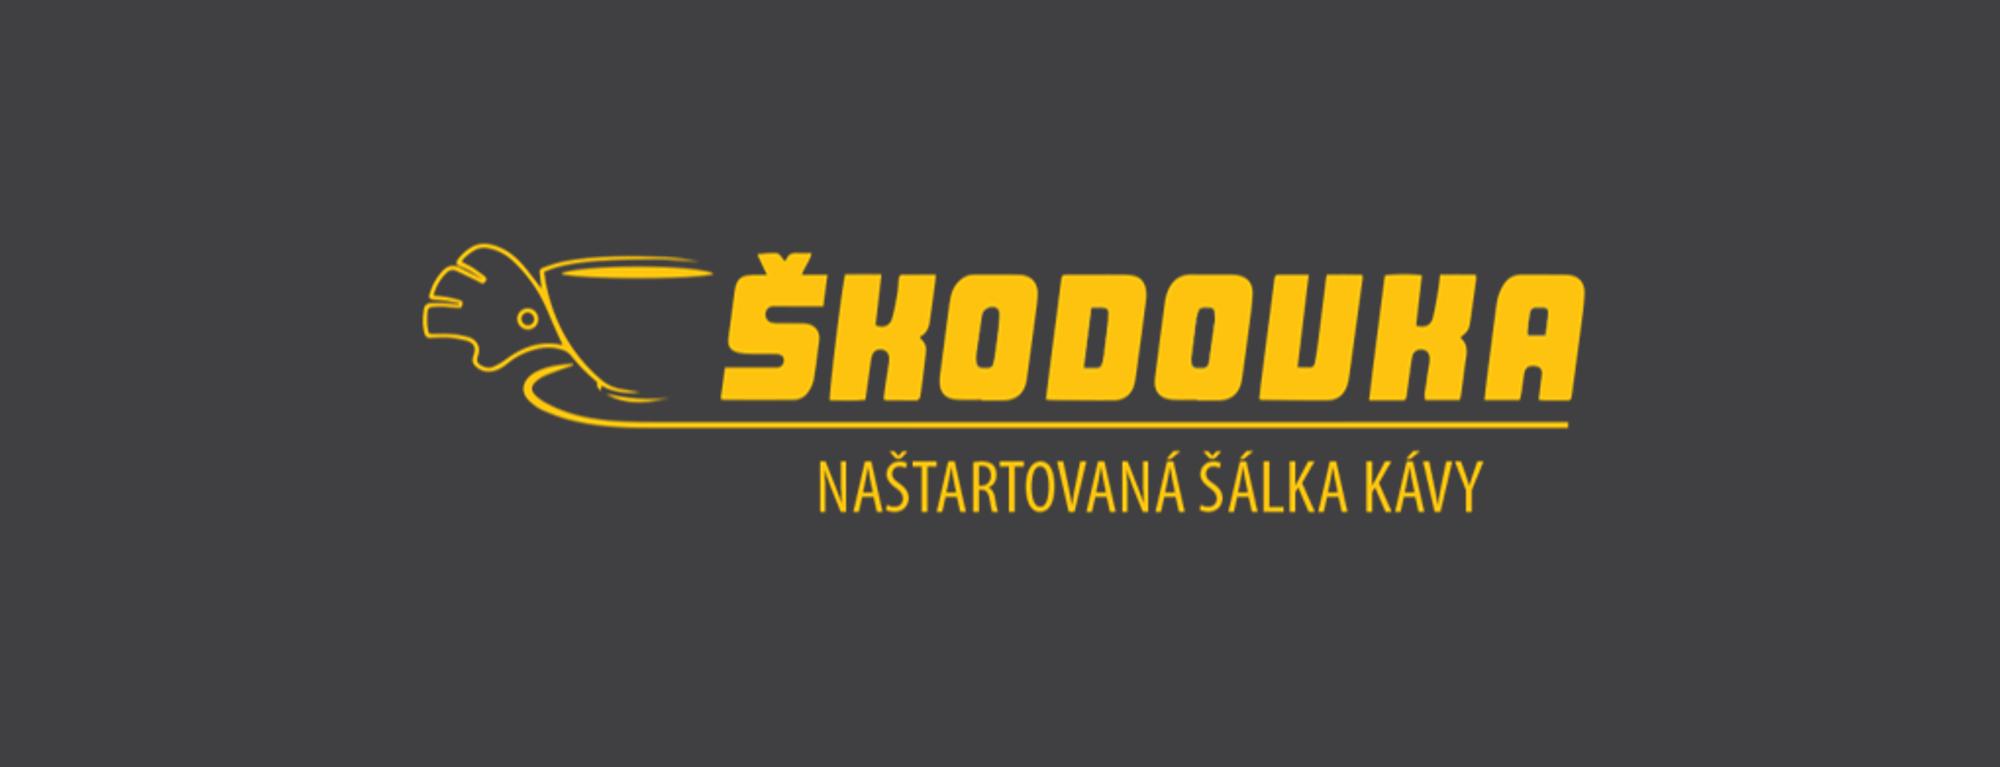 klient-wooacademy-cafe-skodovka-logo (2)